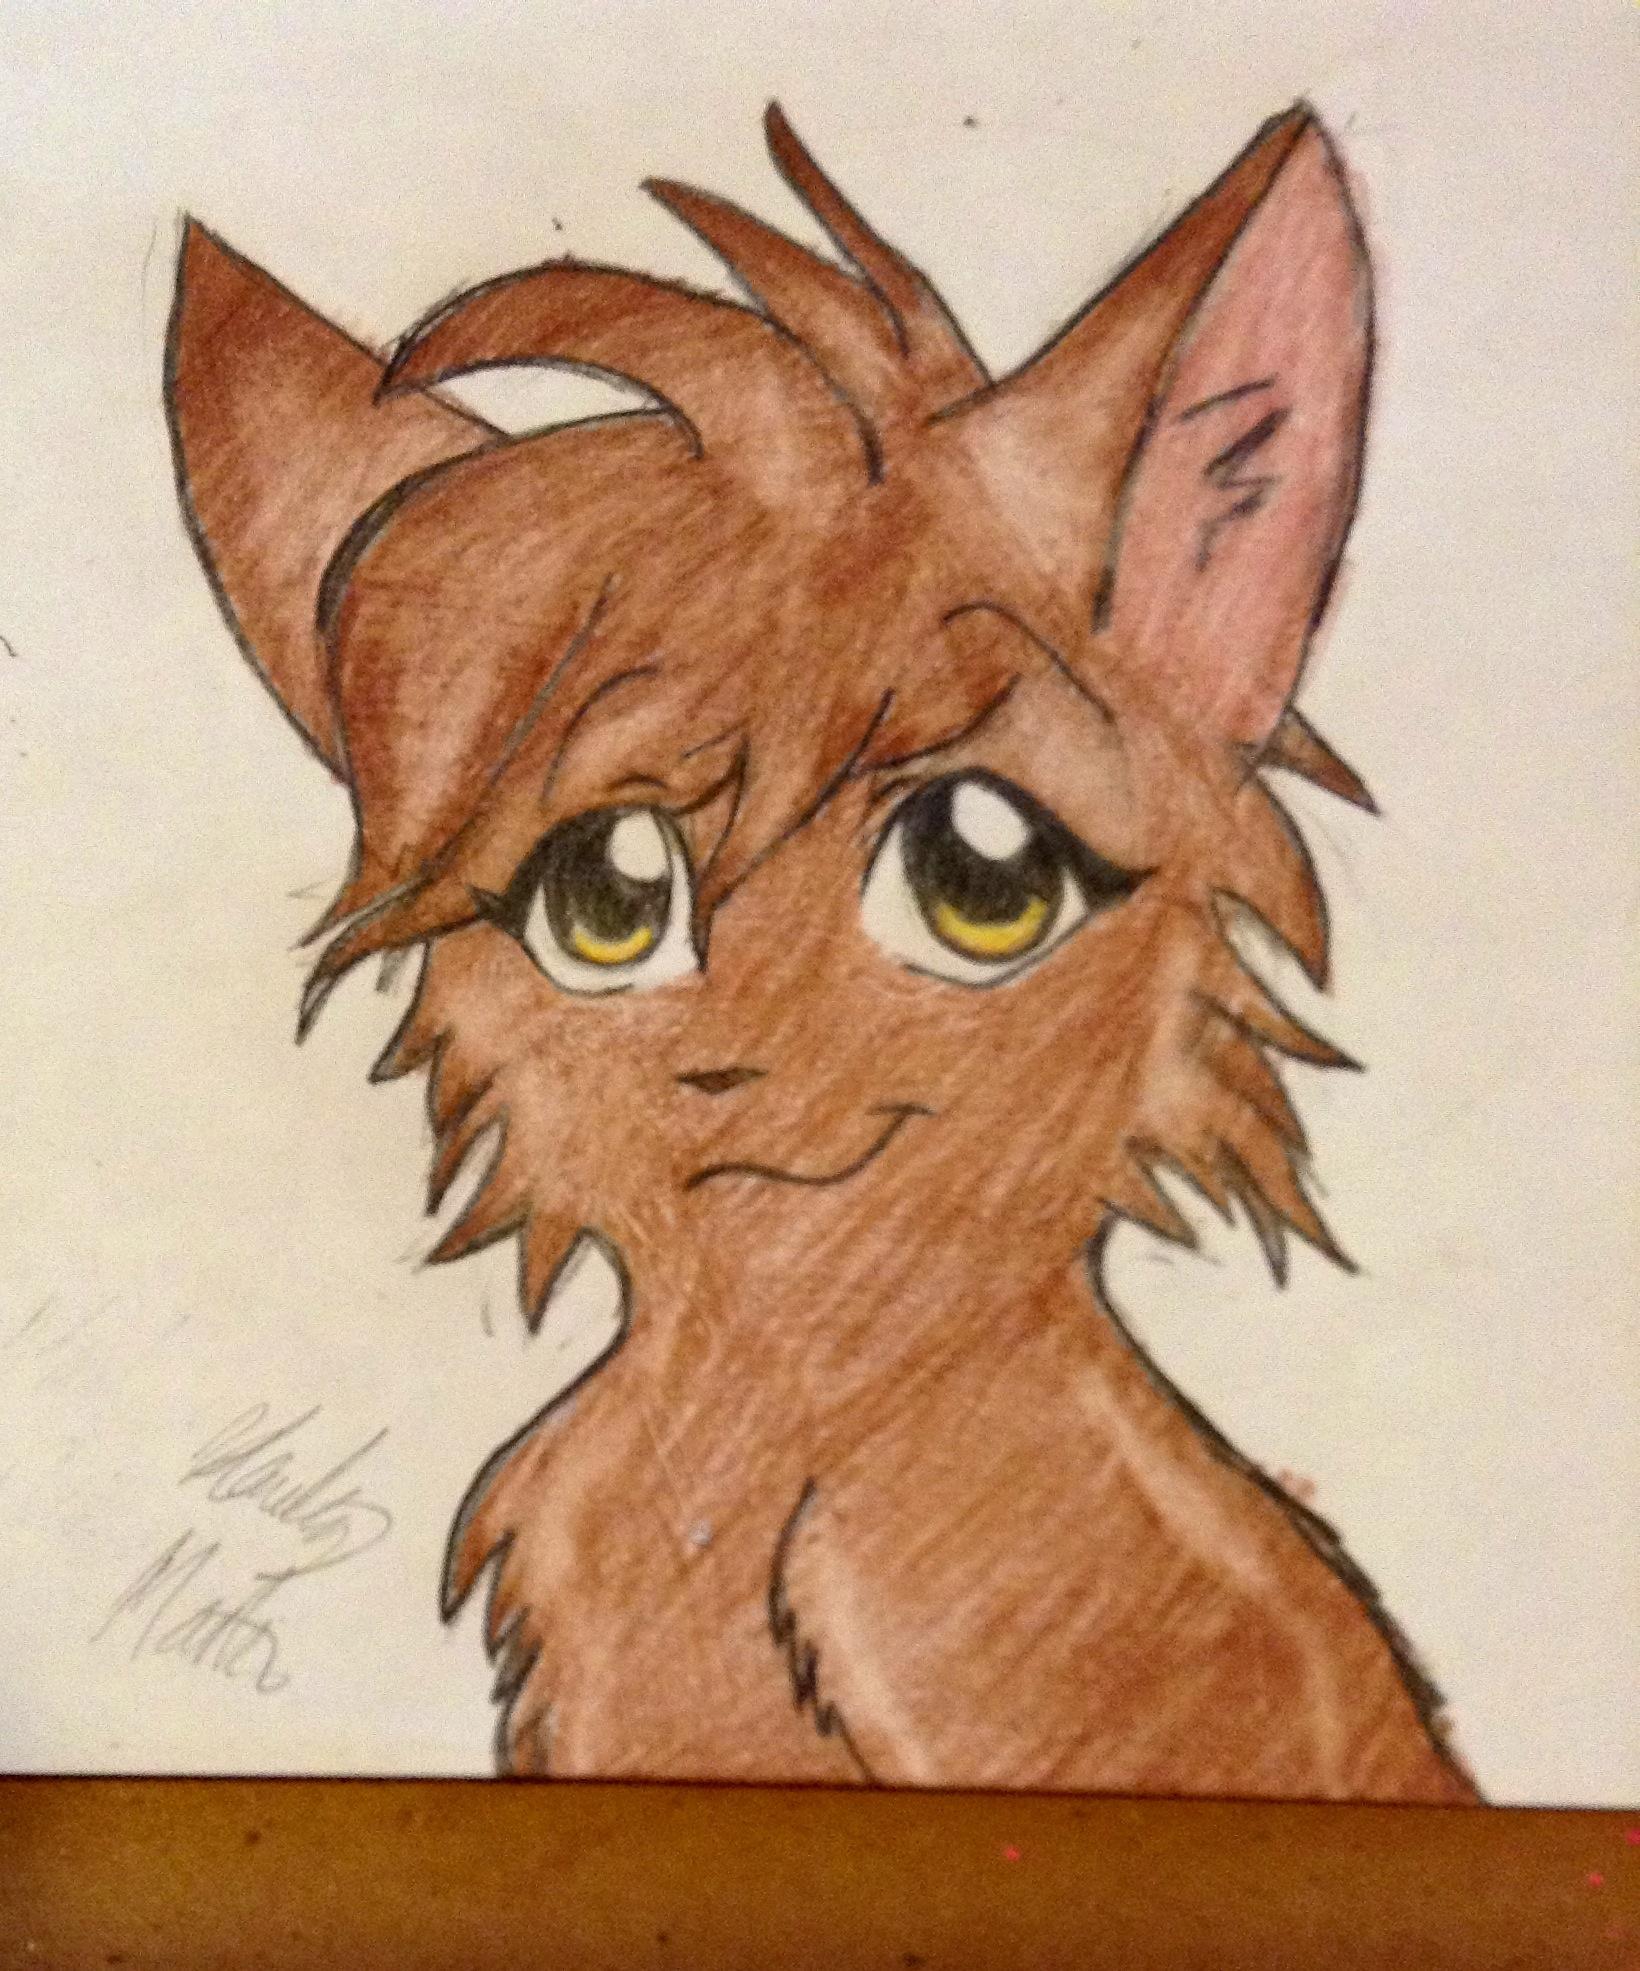 Drawn pug warrior Warrior this cat (drawn Cat